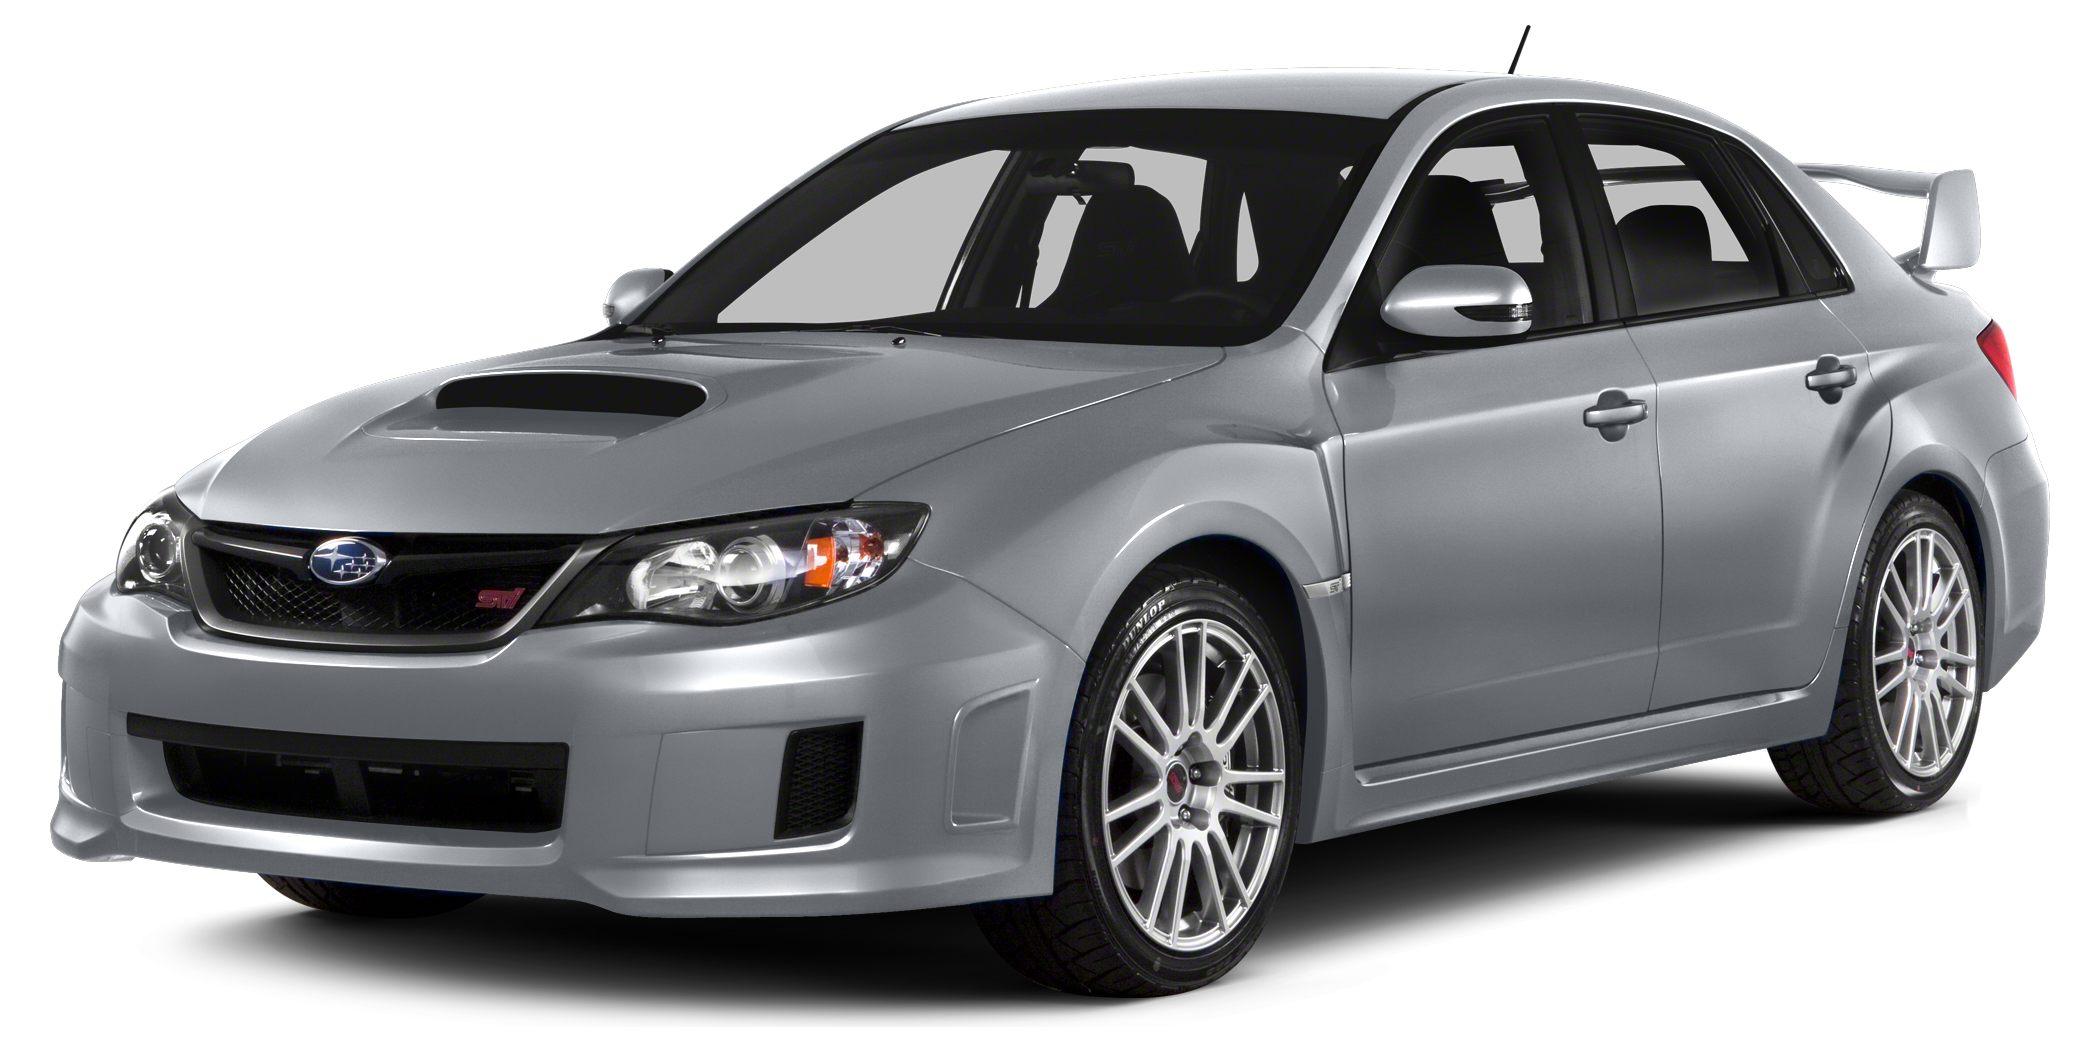 2014 Subaru Impreza WRX STi Miles 55652Color Ice Silver Metallic Stock 004650 VIN JF1GV8J66E